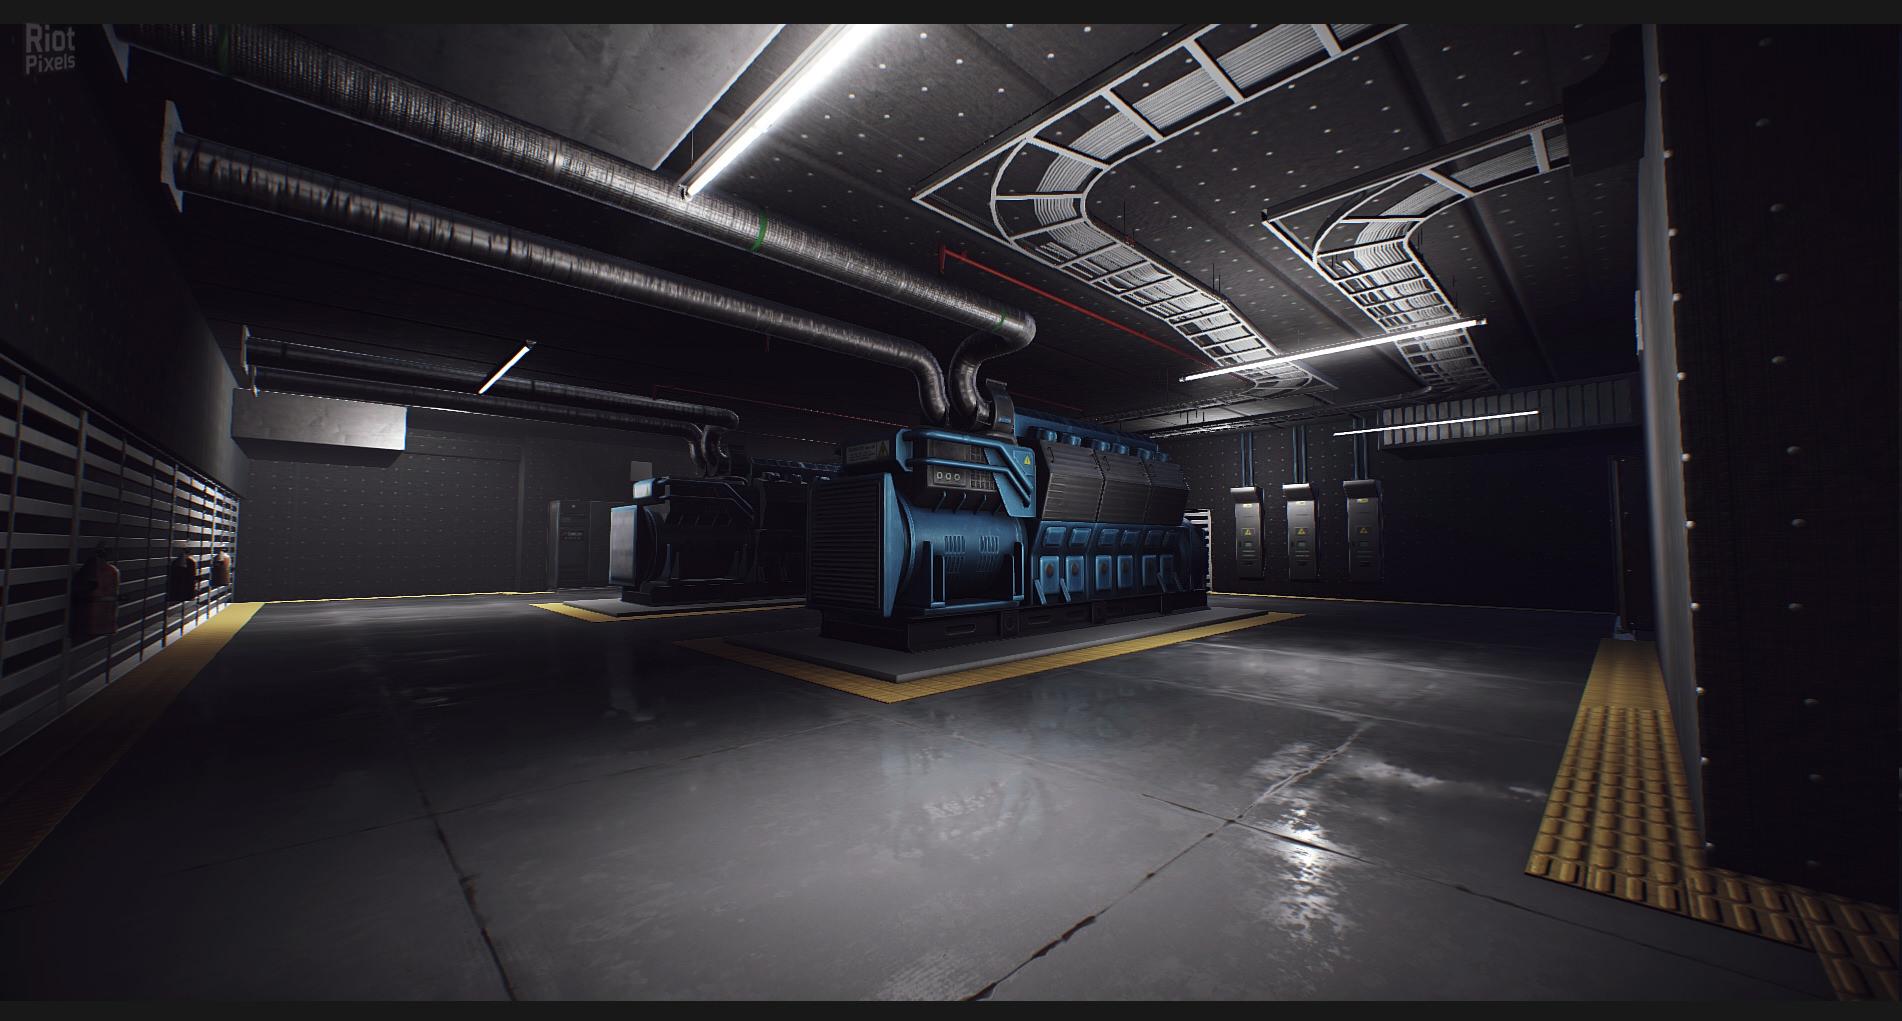 Escape from Tarkov - game screenshots at Riot Pixels, images